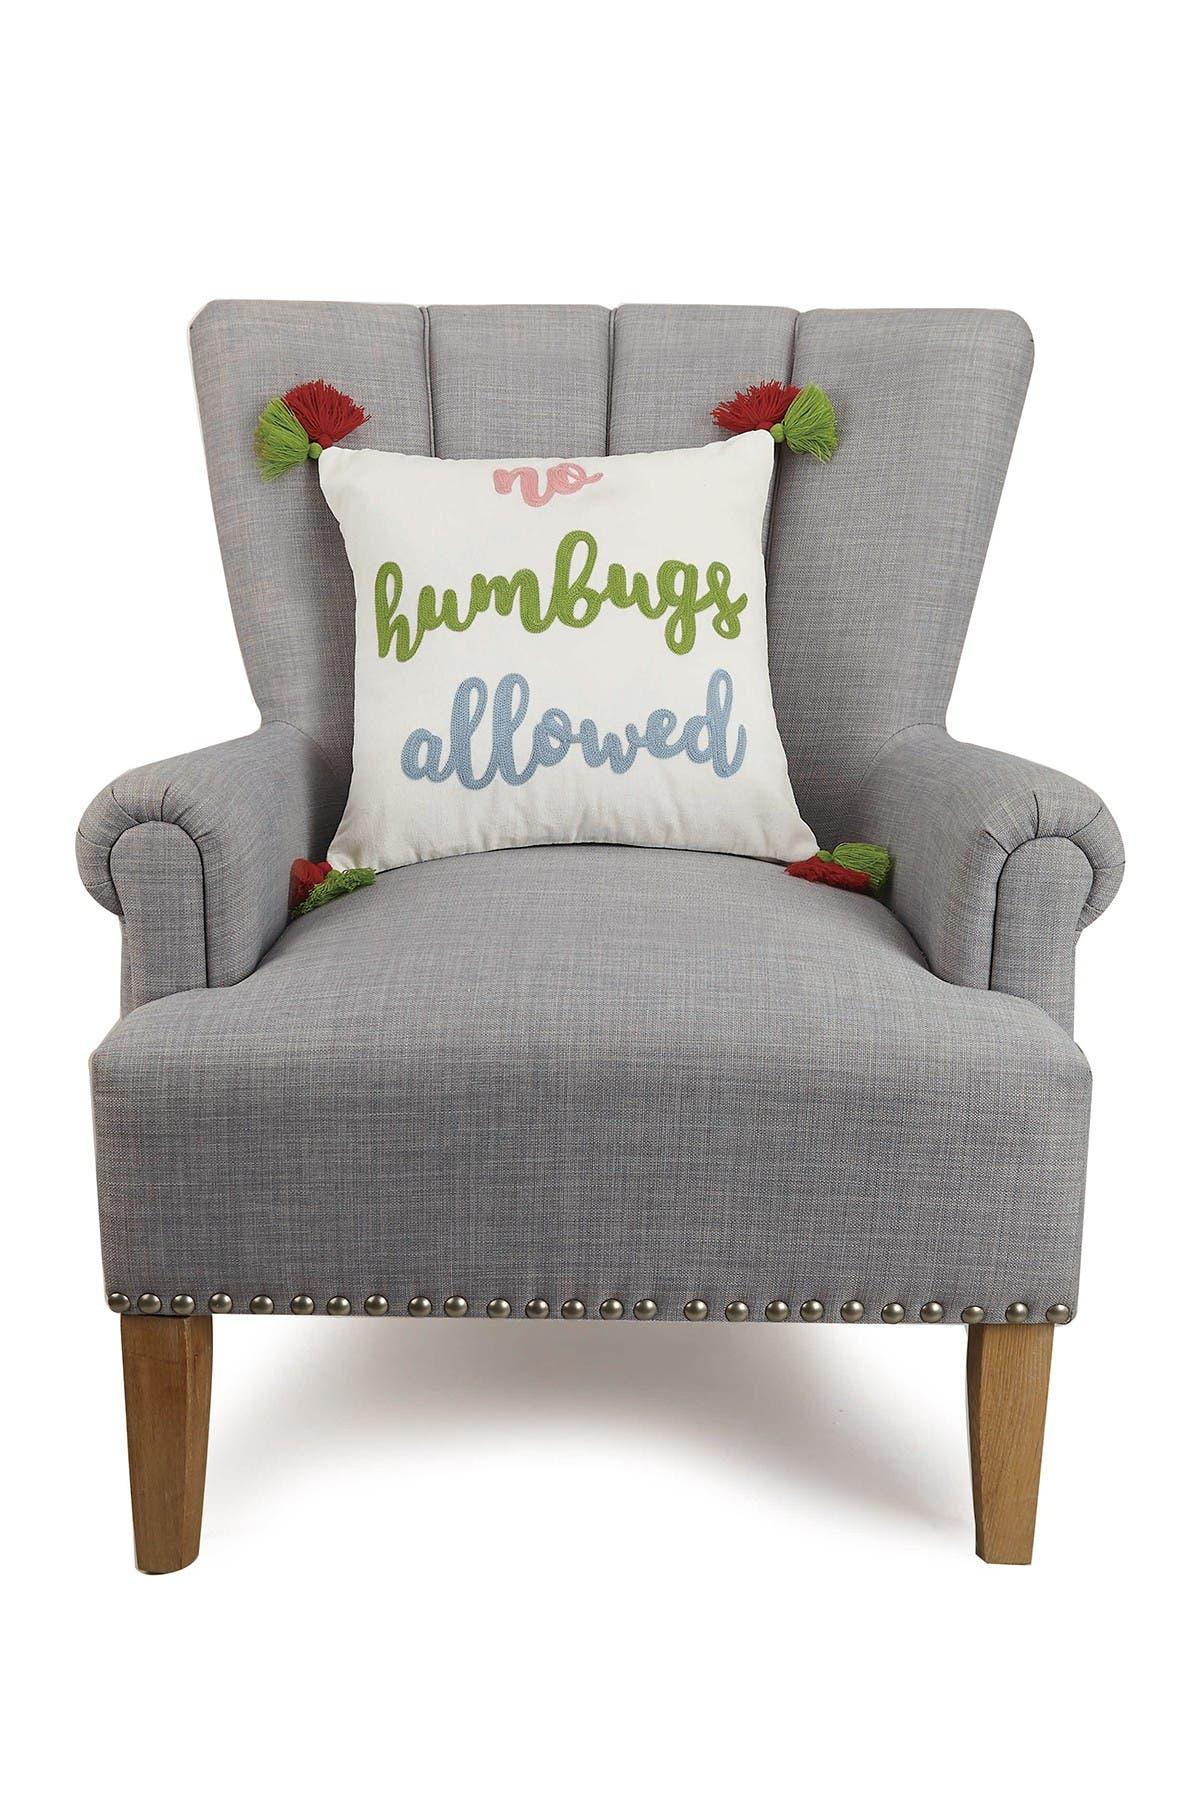 Image of Peking Handicraft Multi No Humbugs Crewel Stitch Tassel Trim Pillow